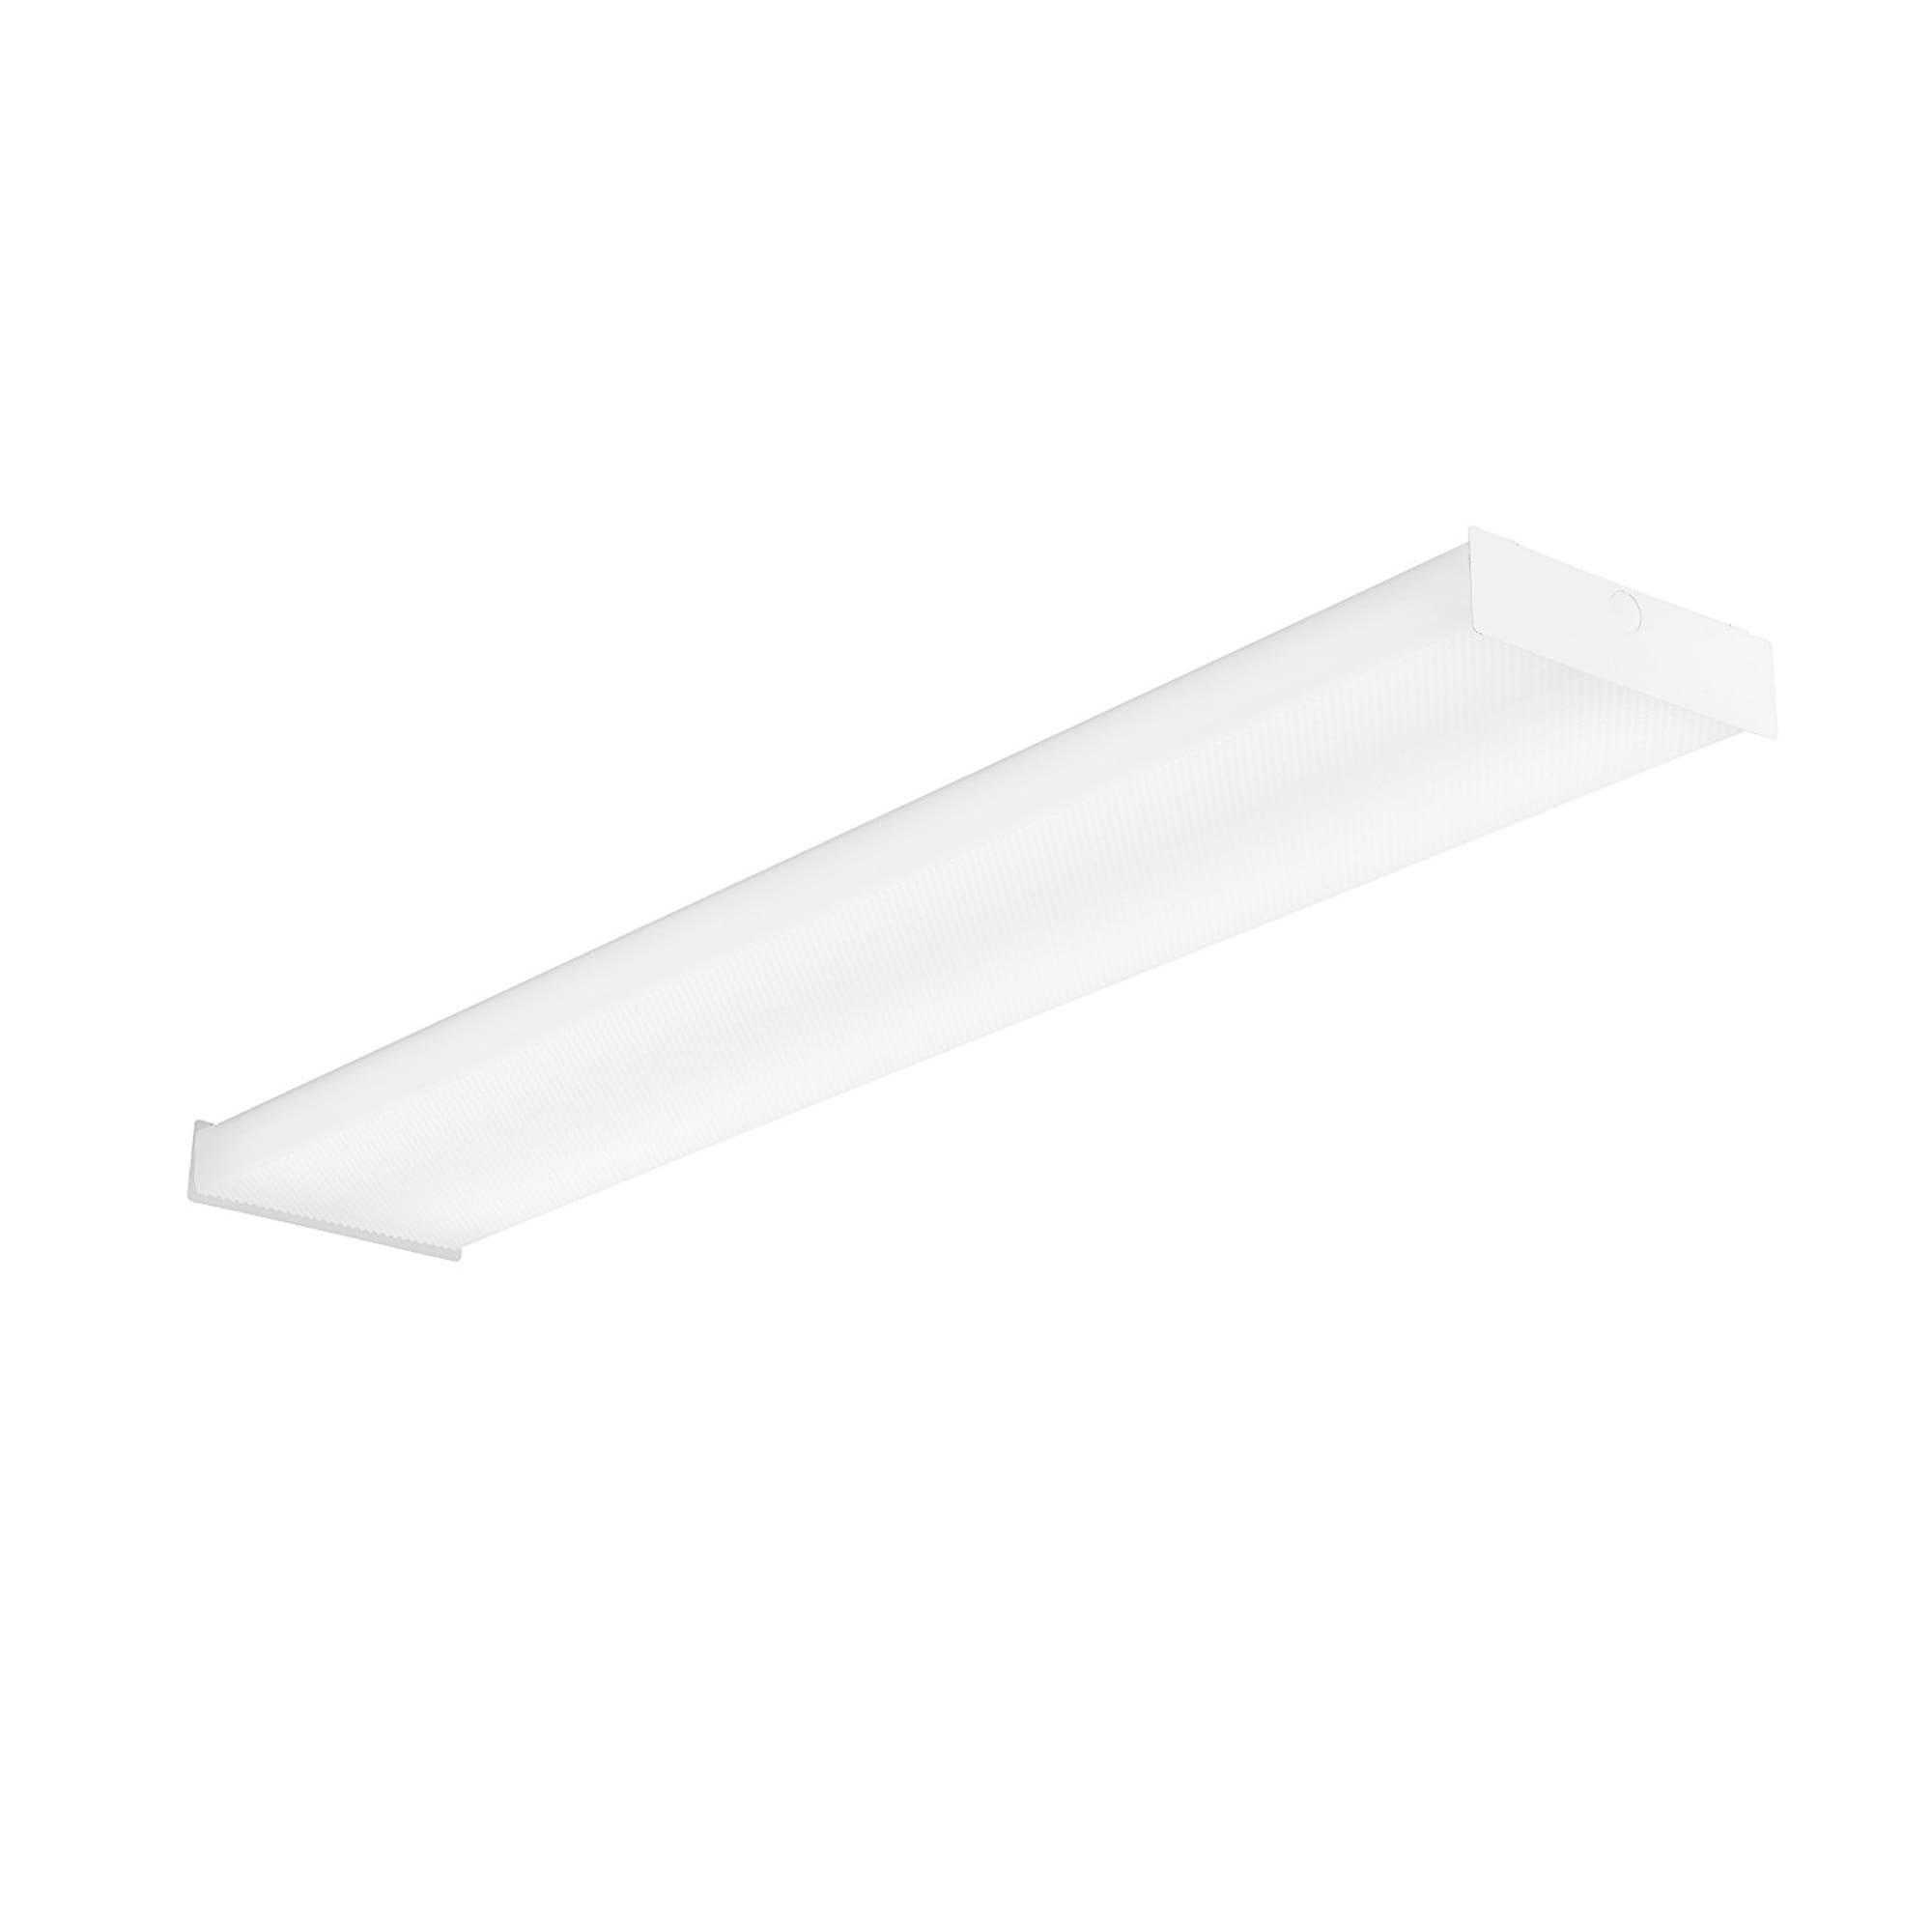 4 foot led lights fixture lighting compare prices at nextag lithonia lighting sbl4 30l ez1 lp835 4 ft 3000 lumens w arubaitofo Choice Image